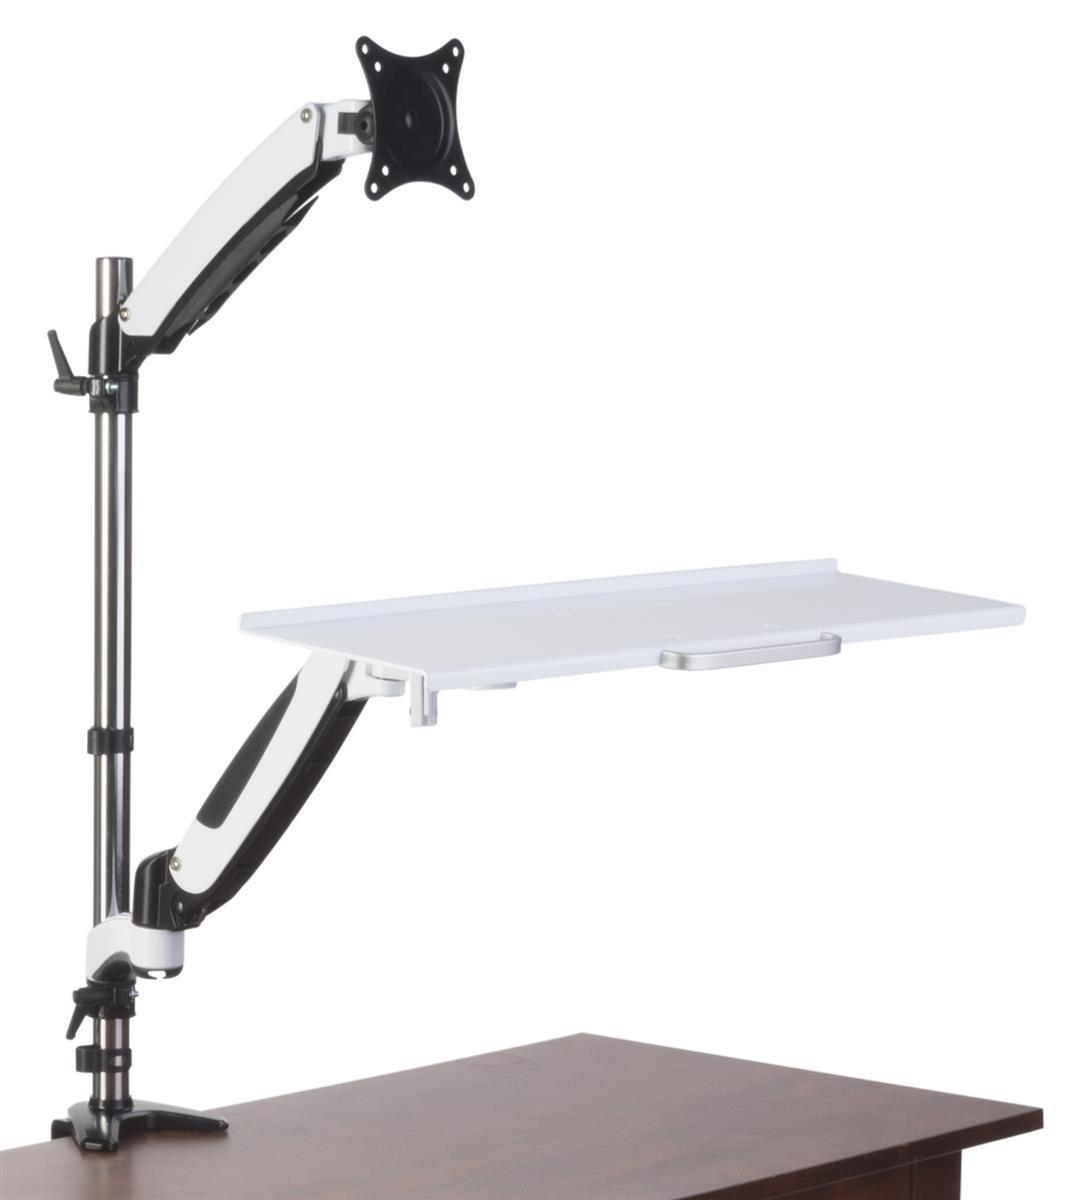 Monitor Desk Mount Stand Tilting Swiveling Amp Rotating